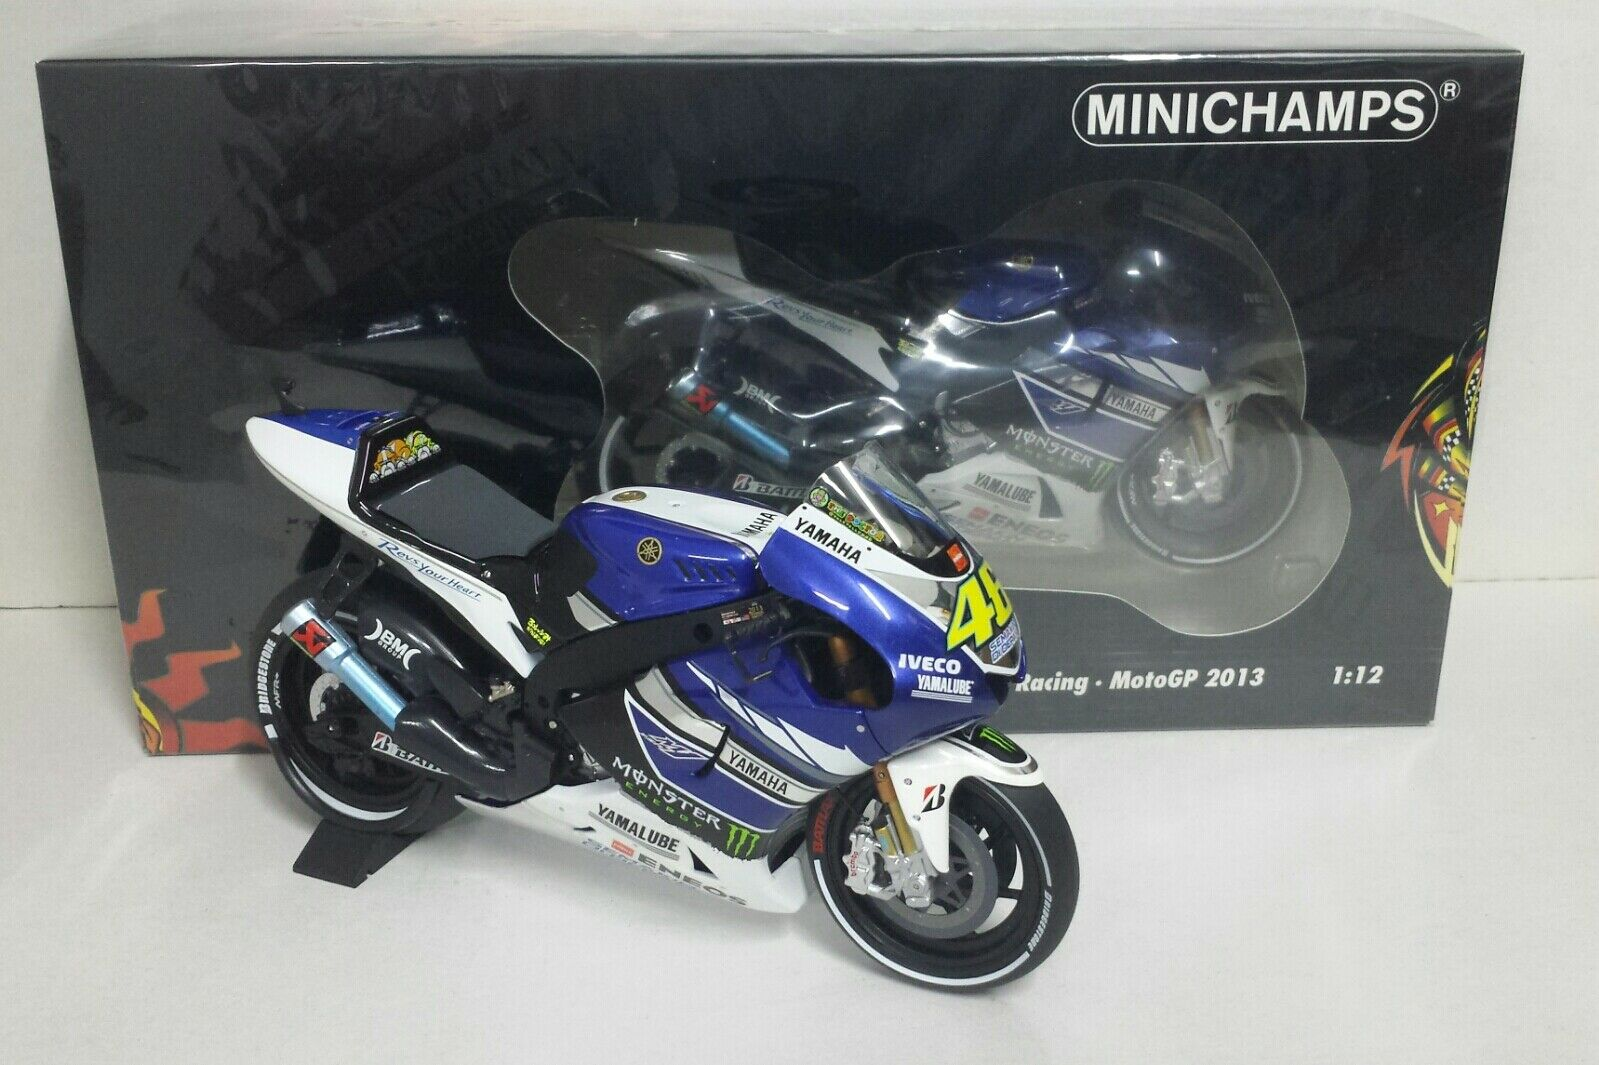 MINICHAMPS VALENTINO ROSSI 1/12 YAMAHA YZR M1 MOTOGP 2013 L.EDITION NEW